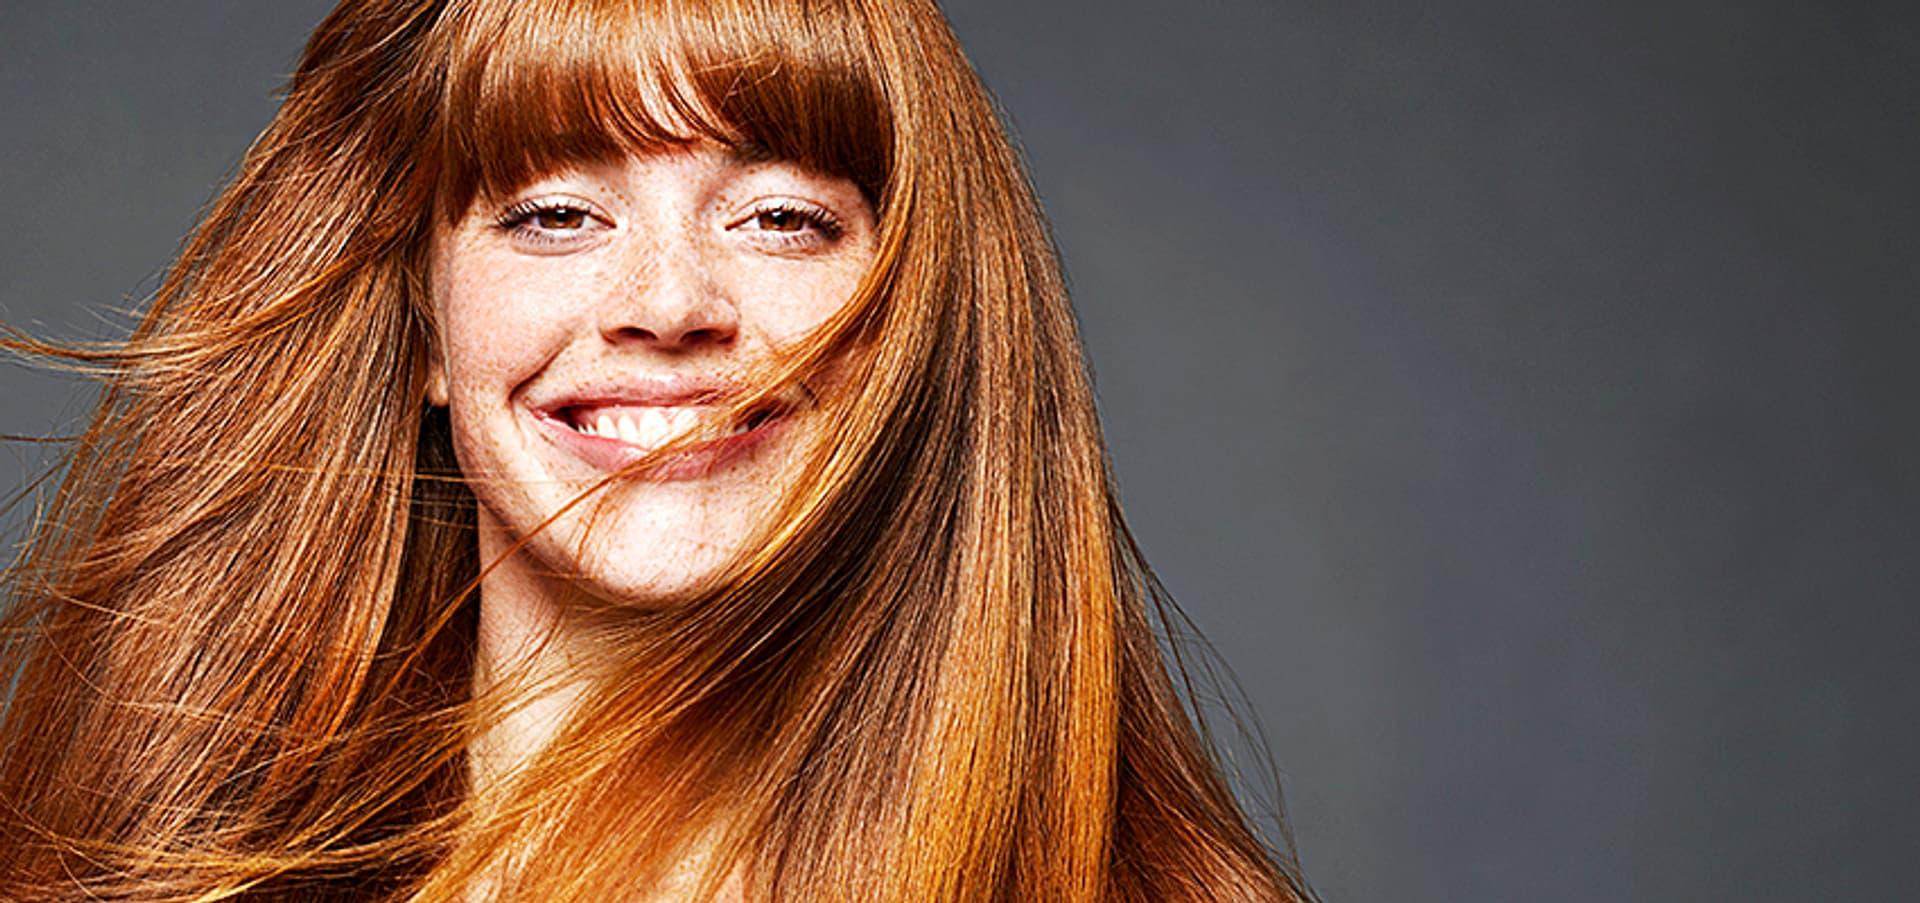 Eine Frau mit glattem rotem Haar